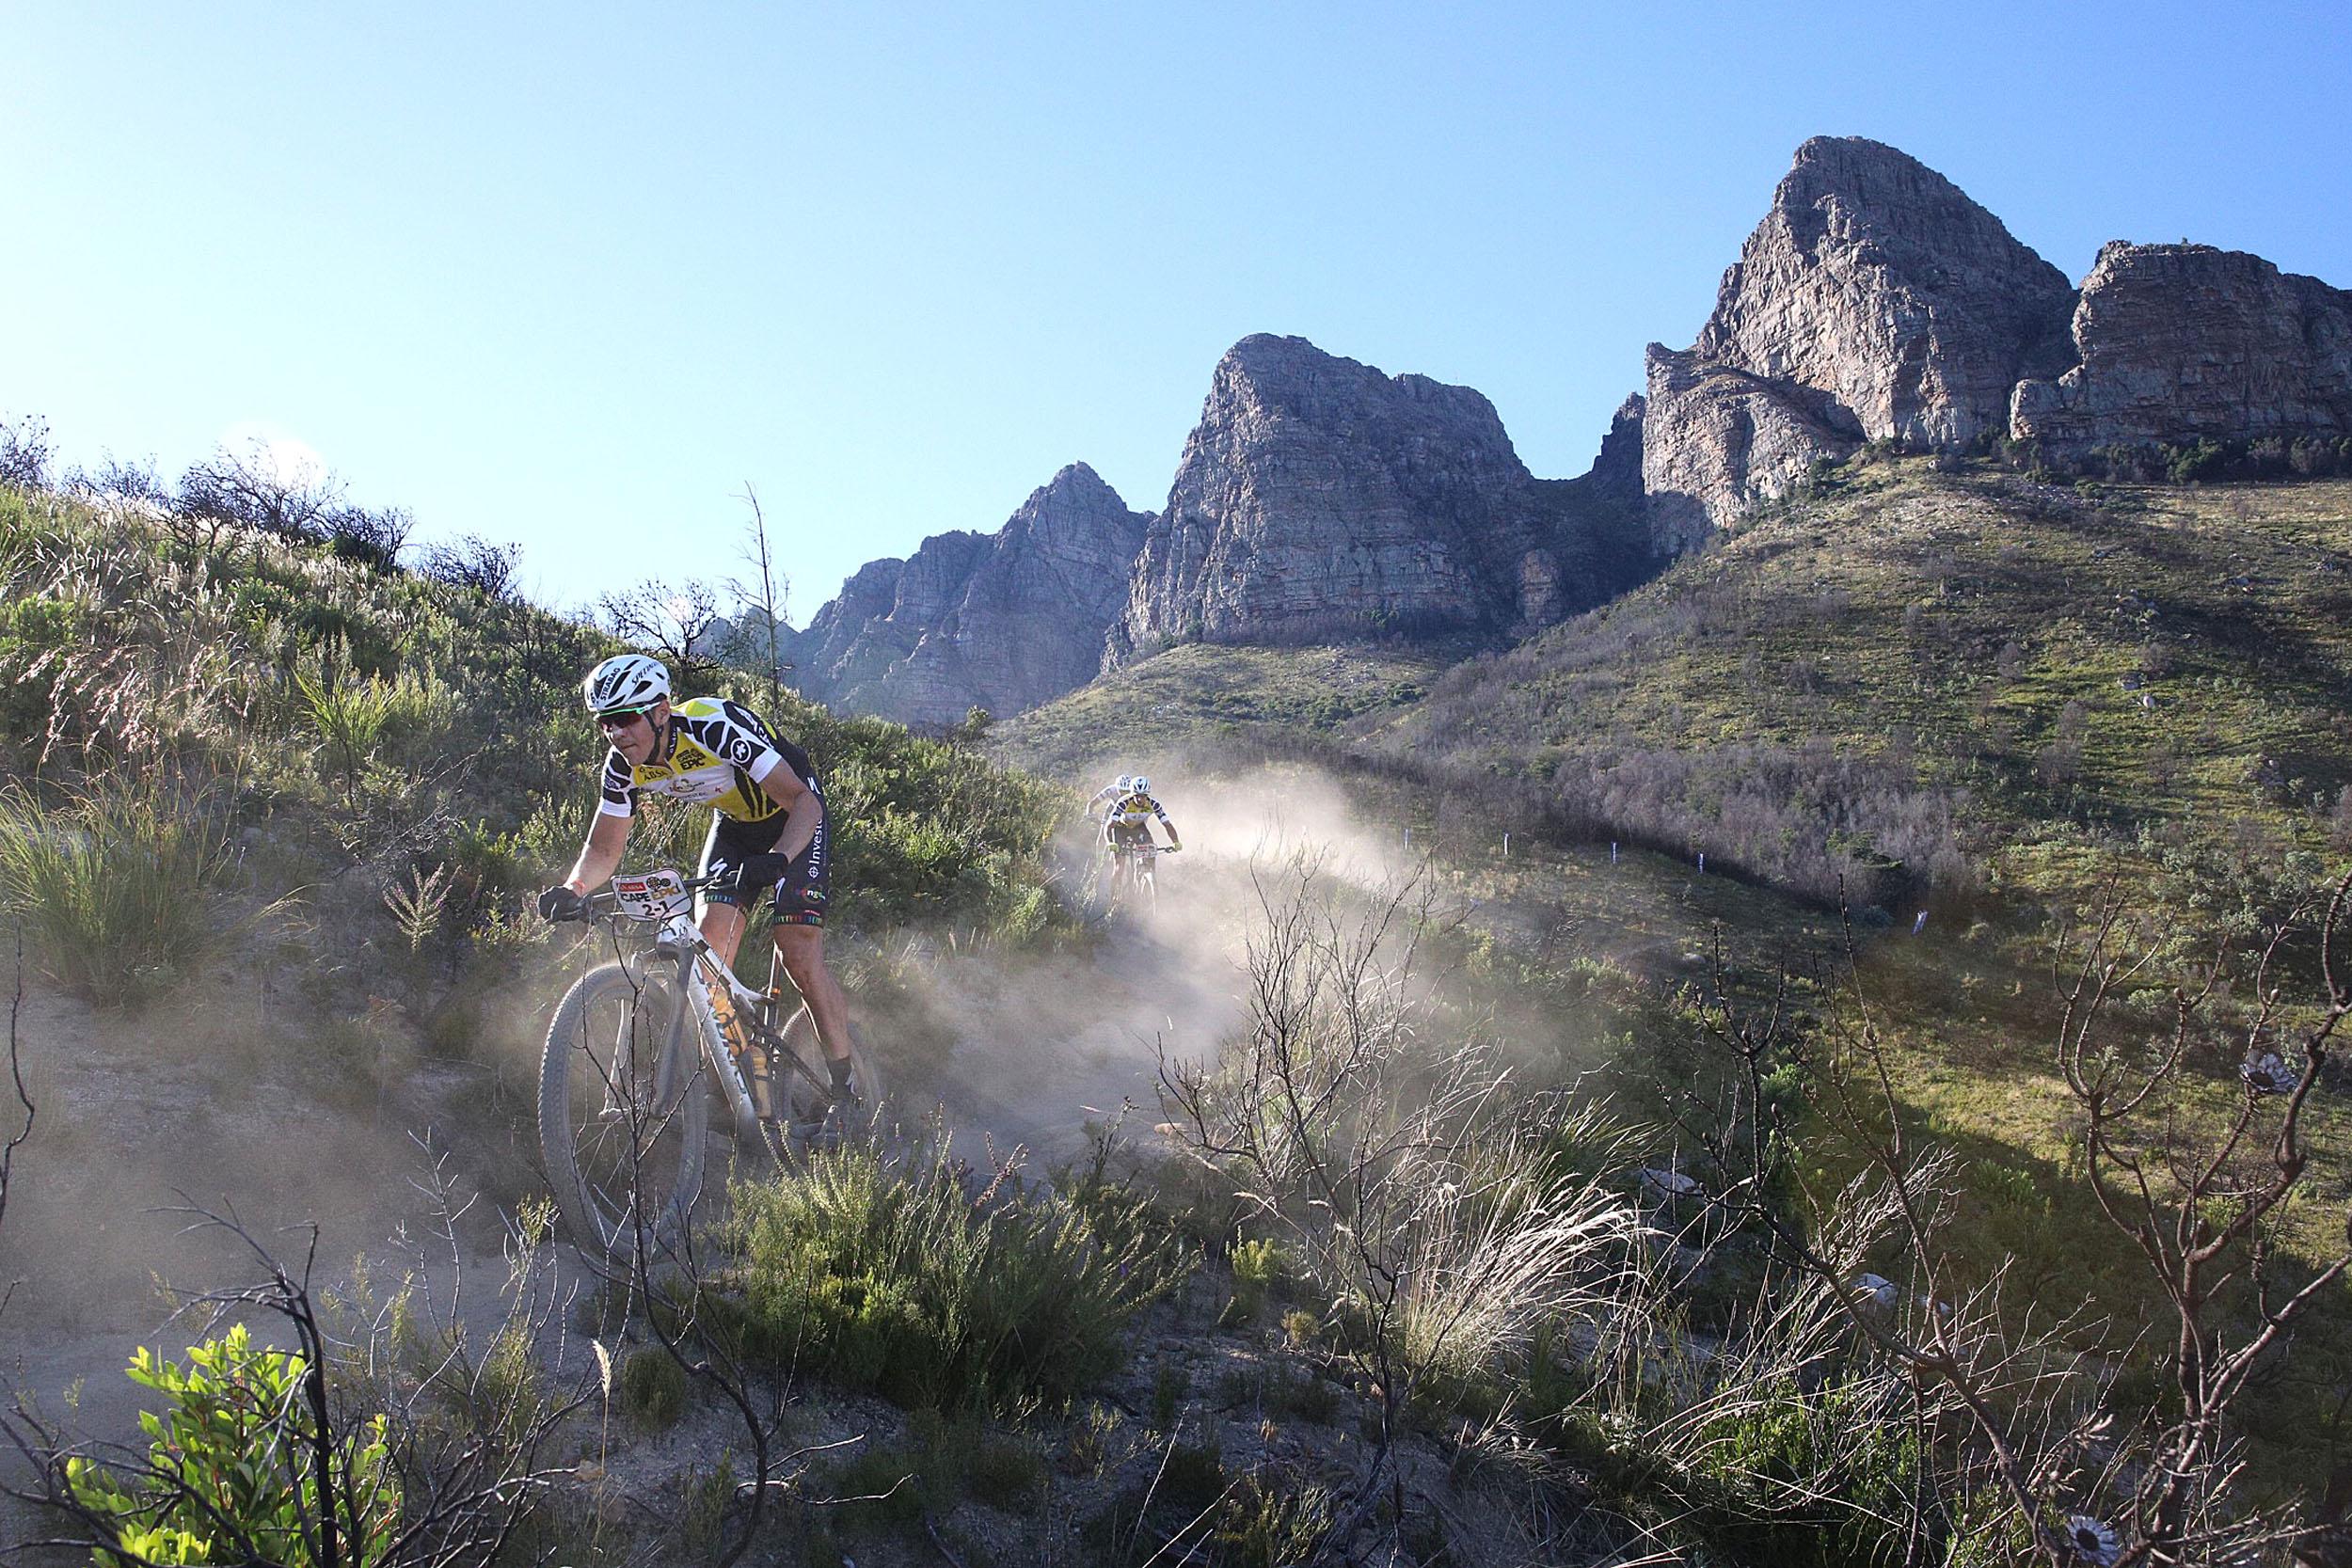 Kulhavy_Grotts_by Greg Beadle/CapeEpic/Sportzpics